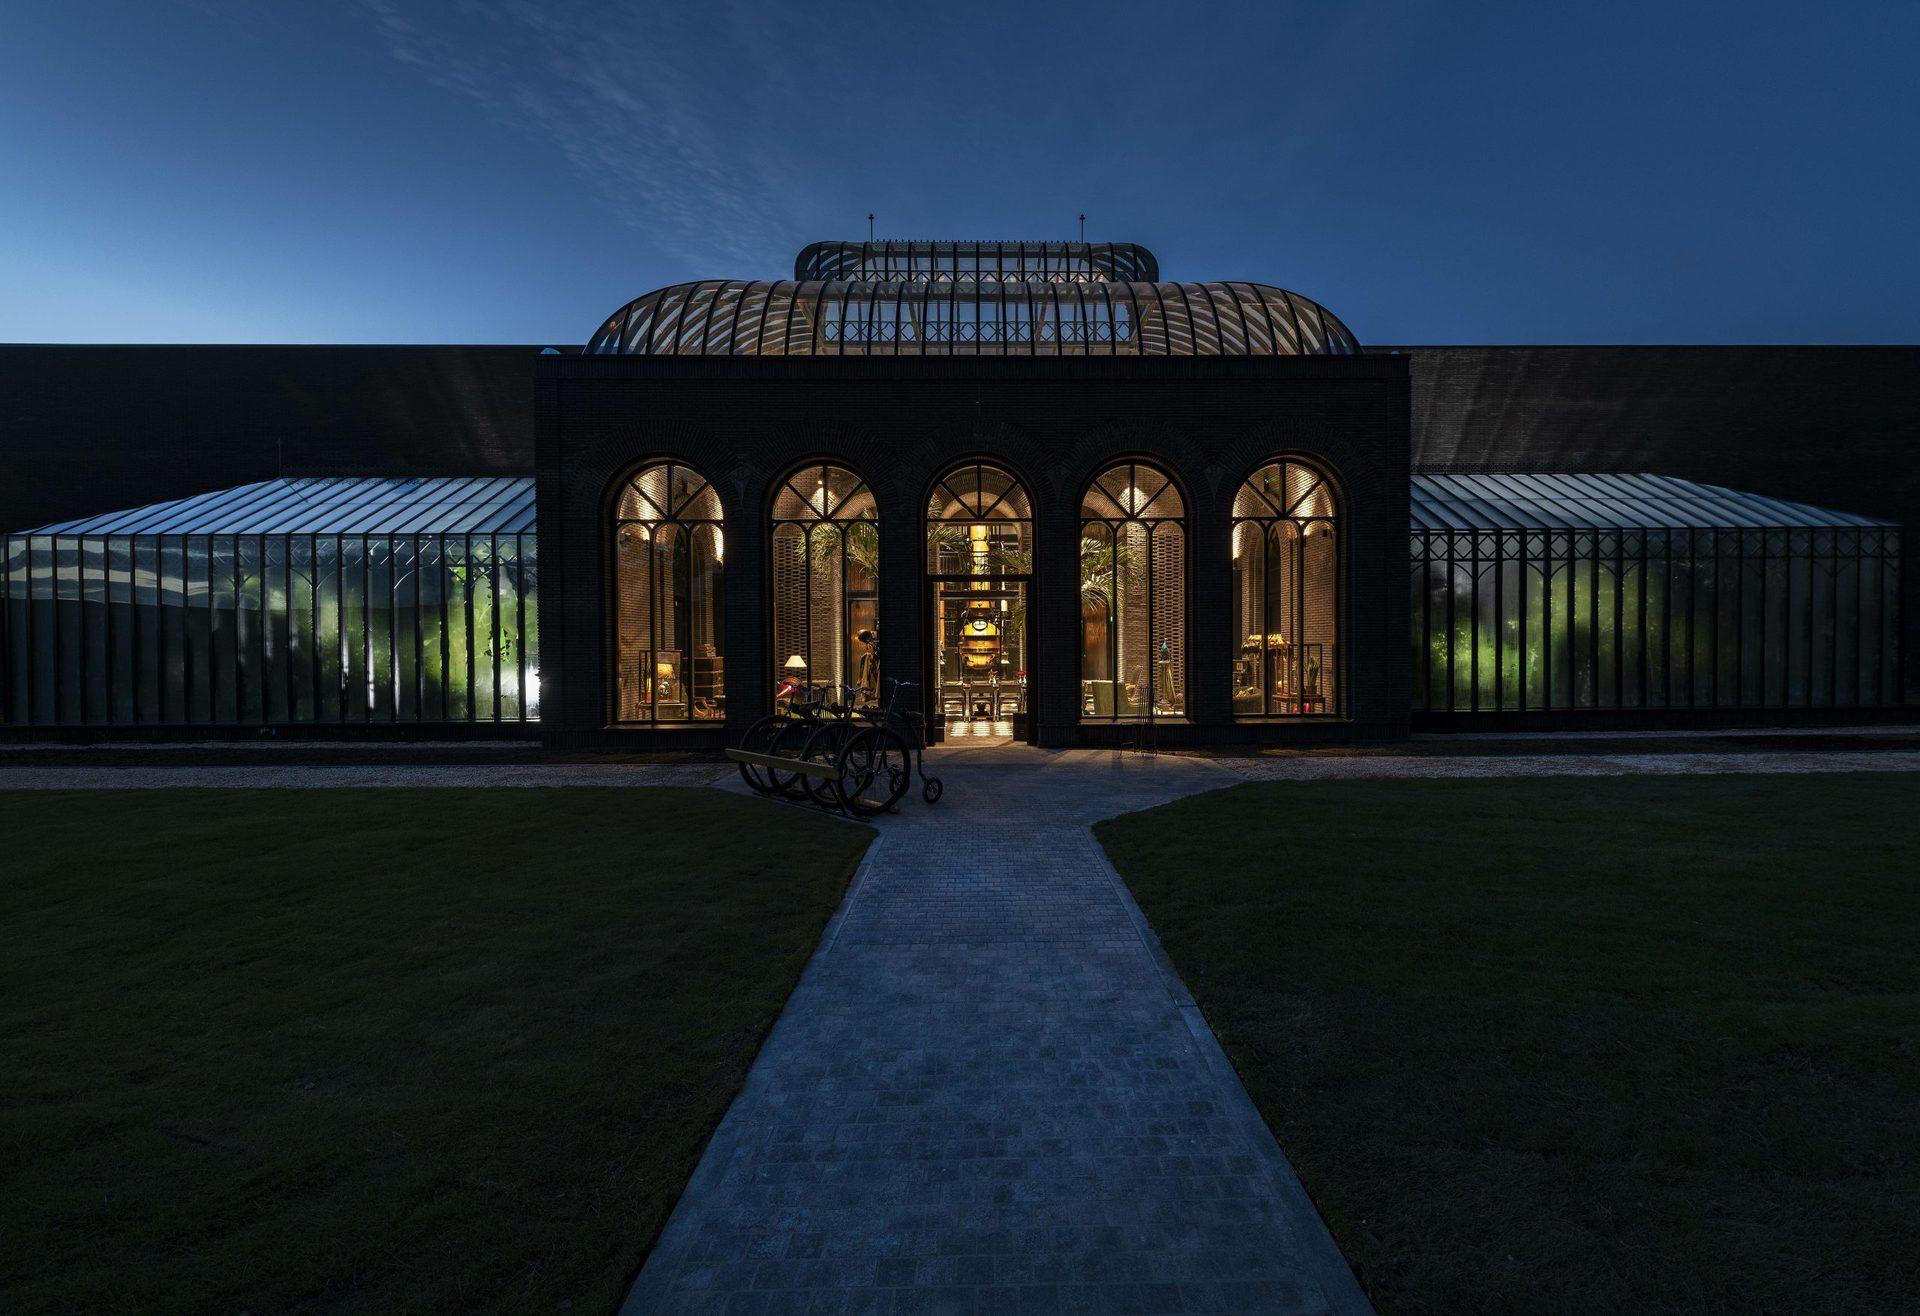 hendricks-gin-palace